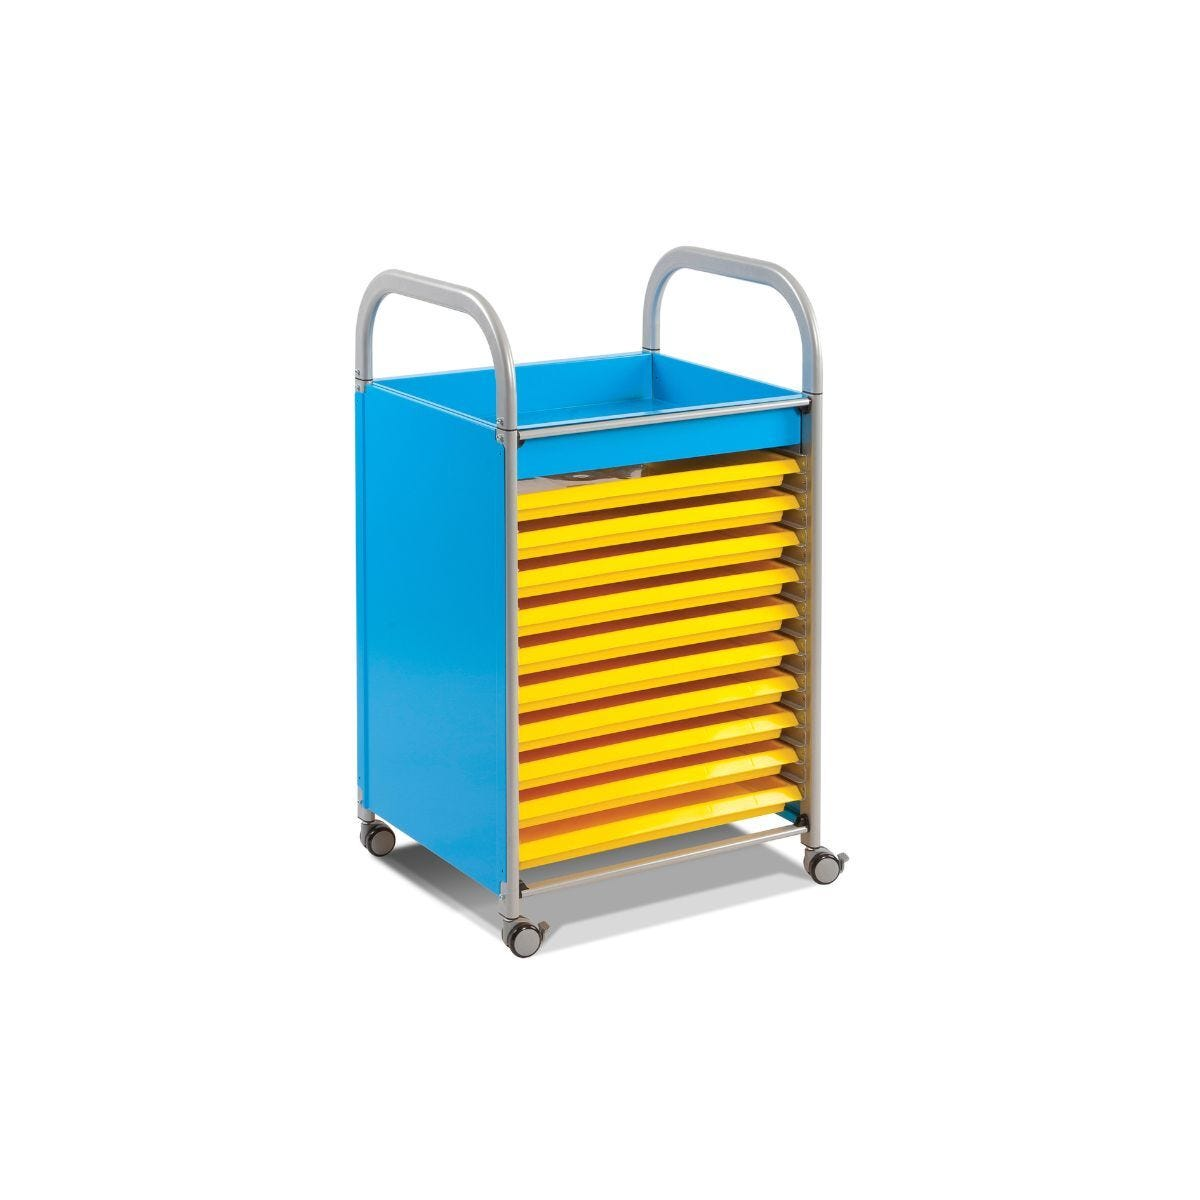 Callero Art Trolley 10 Trays